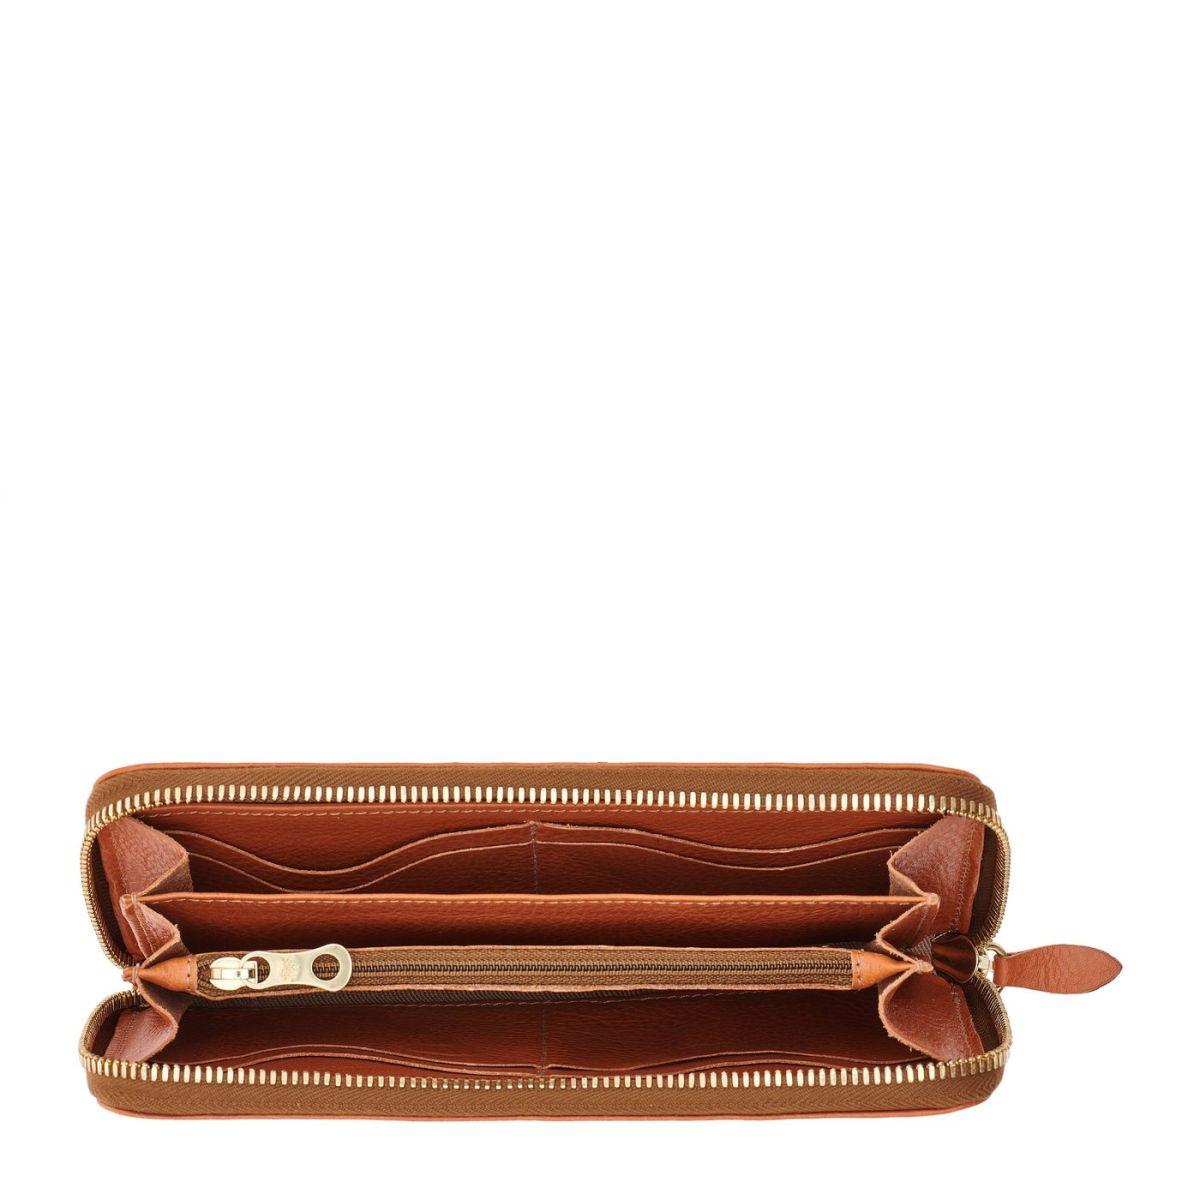 Women's Zip Around Wallet in Cowhide Leather color Caramel - SZW033 | Details